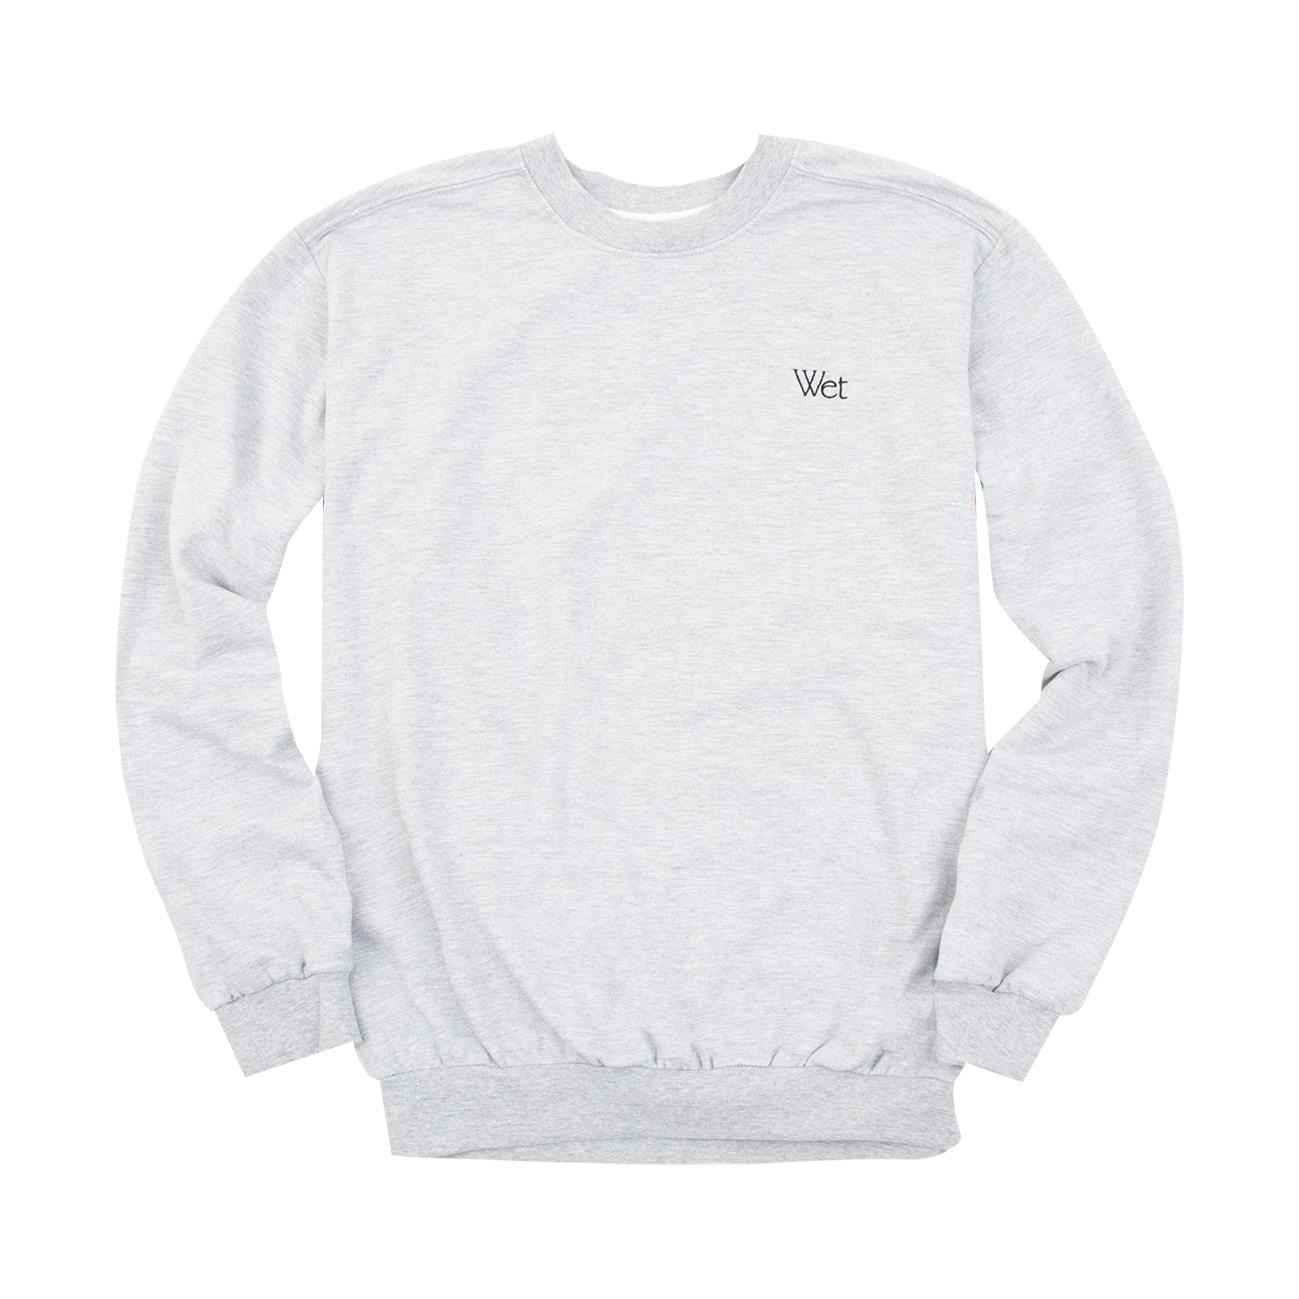 Wet - Grey Embroidered Crewneck Sweatshirt